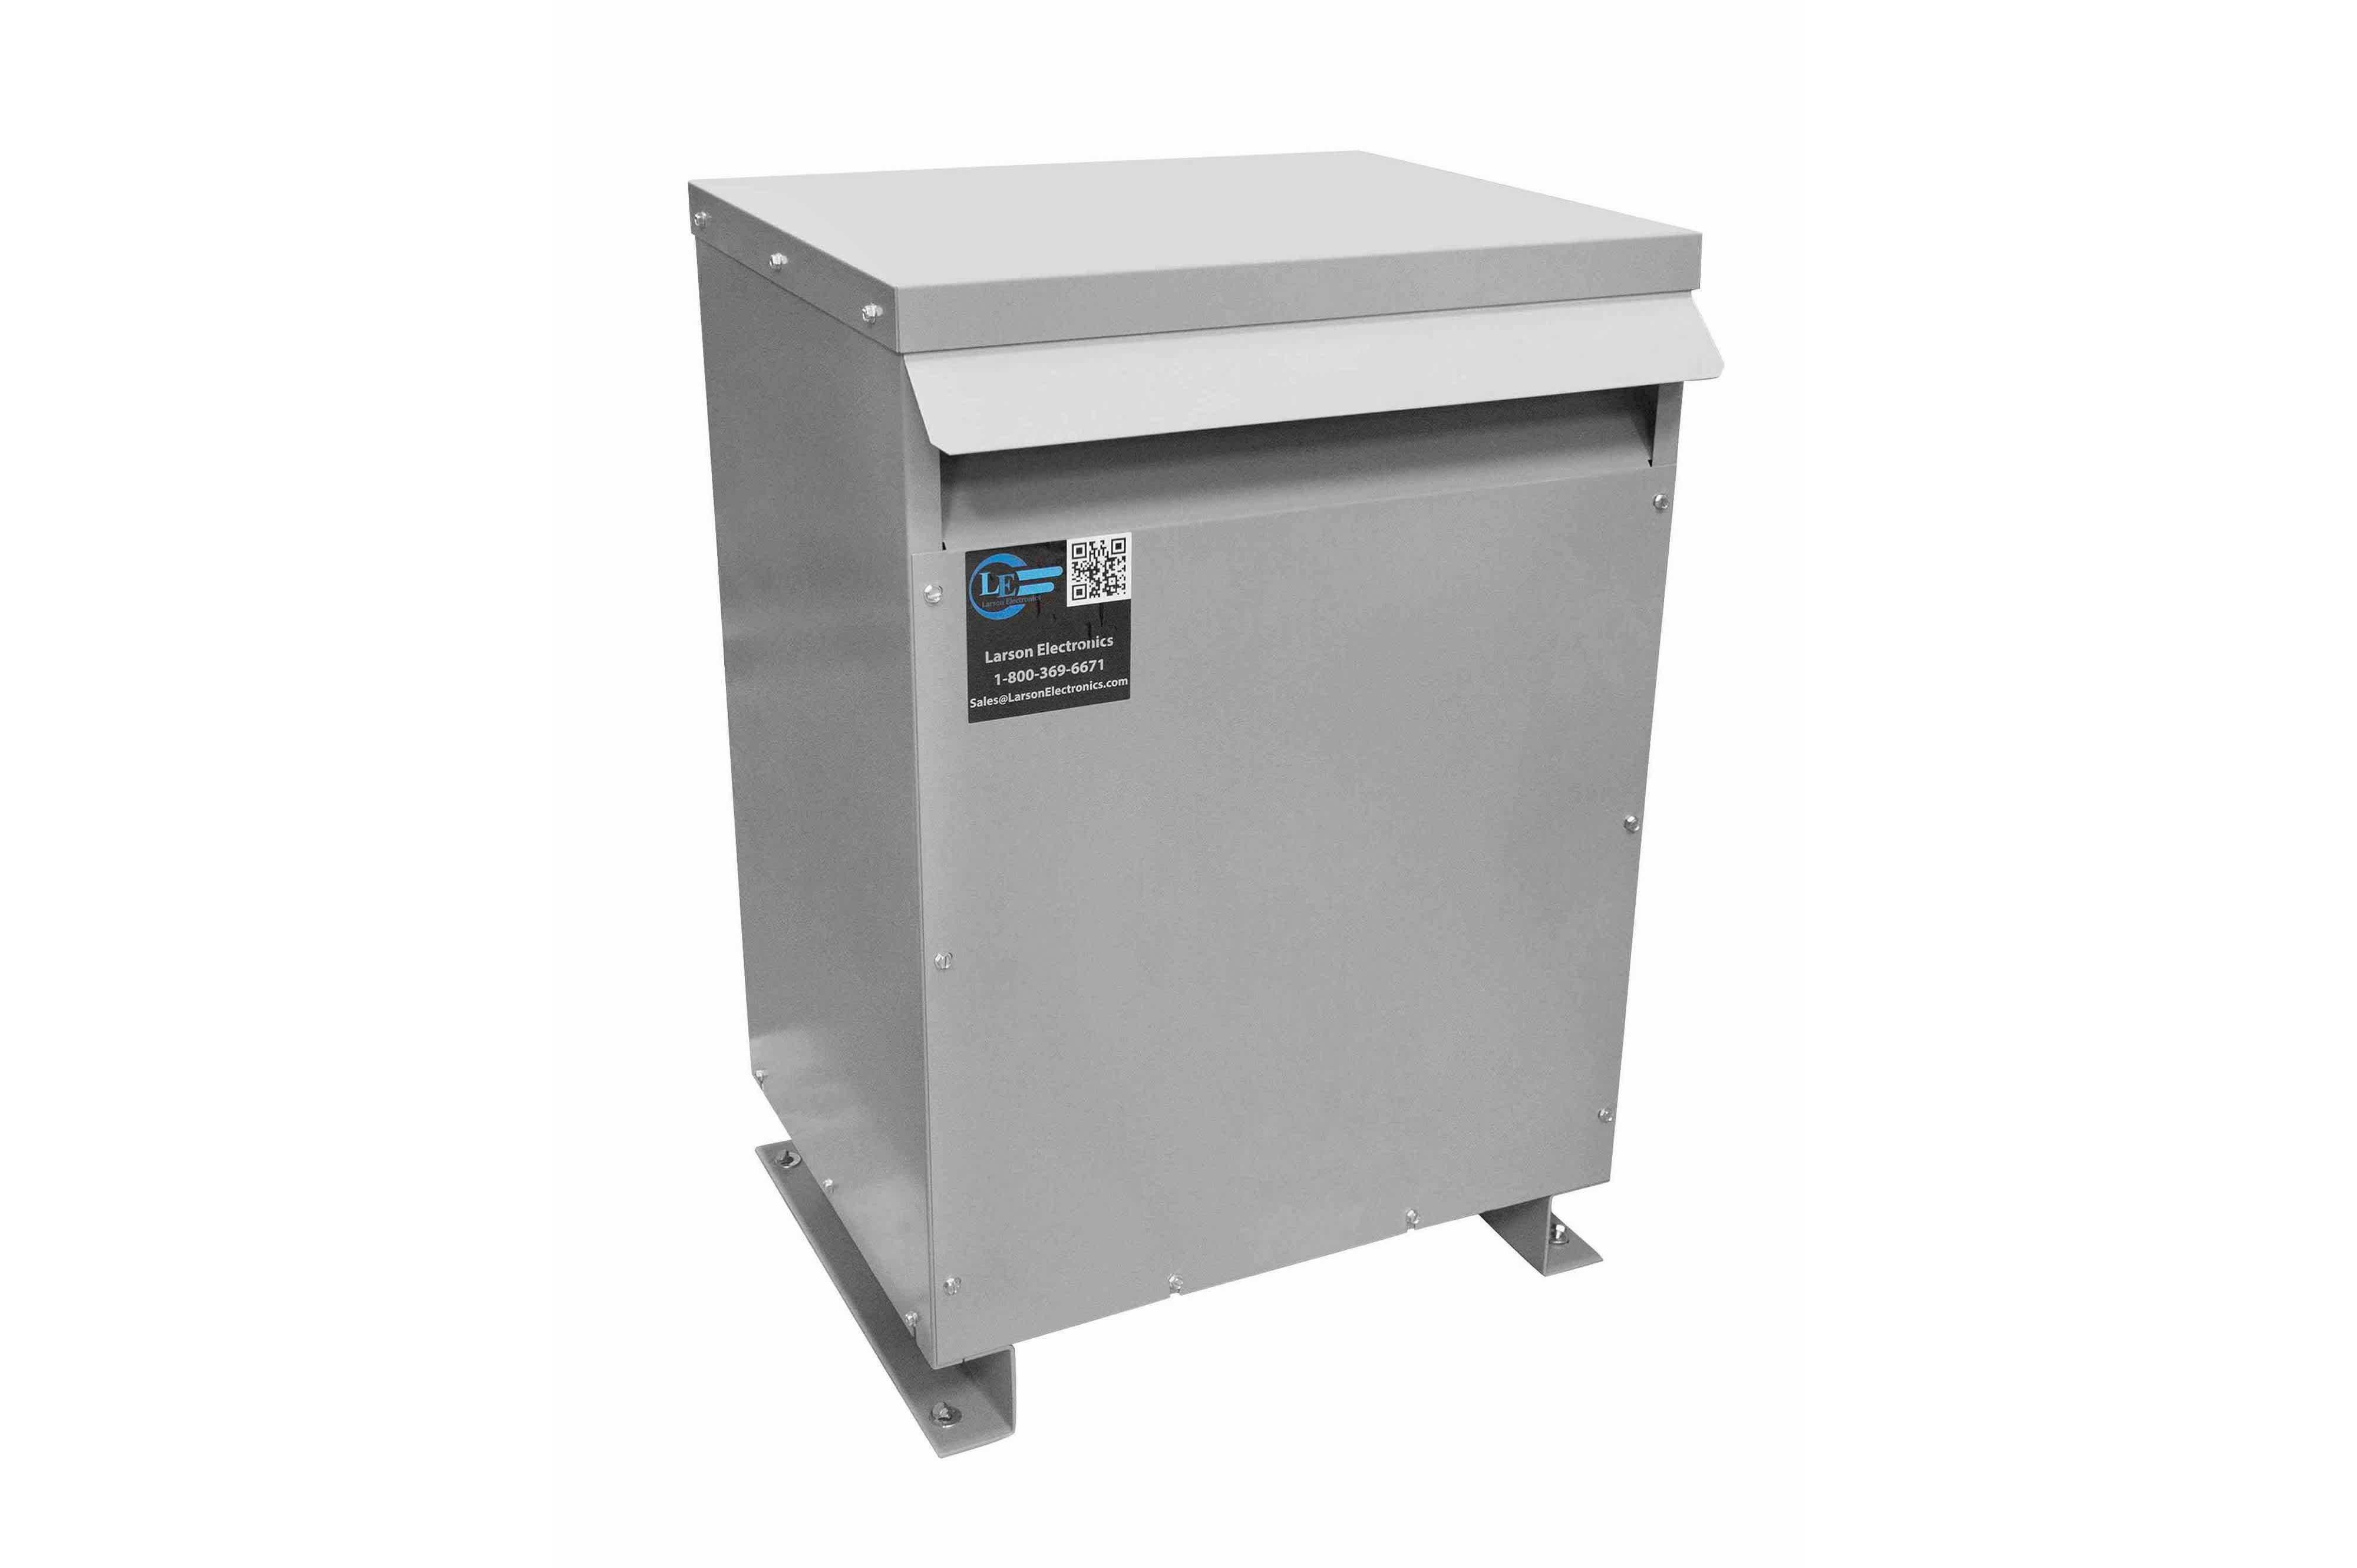 35 kVA 3PH Isolation Transformer, 415V Wye Primary, 480V Delta Secondary, N3R, Ventilated, 60 Hz